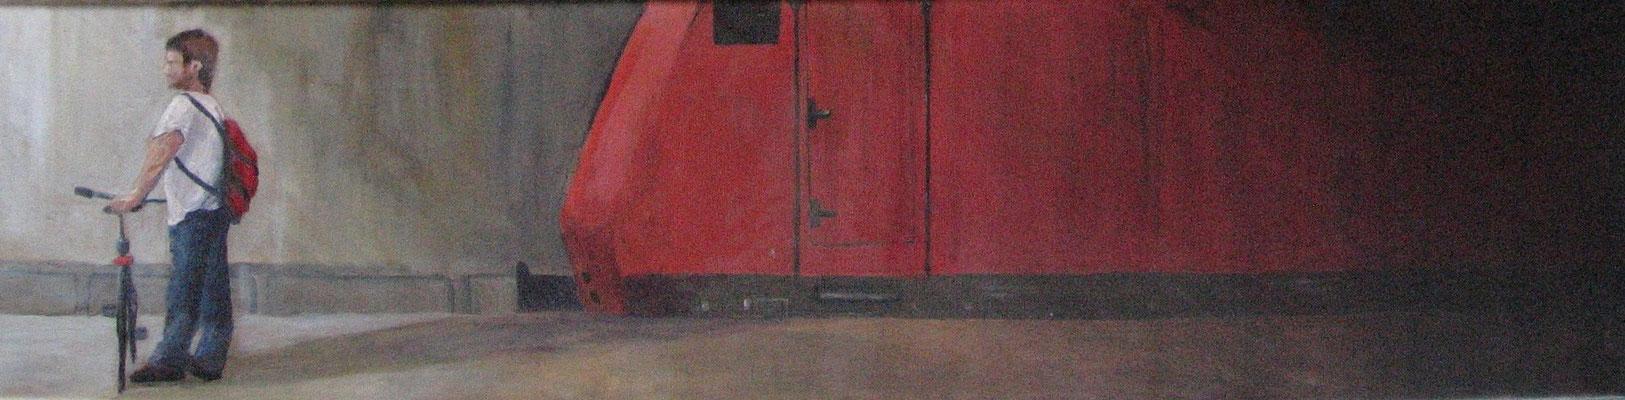 Bahnhofsszene, 2007, Acryl auf Leinwand, 20x80 cm / Warten